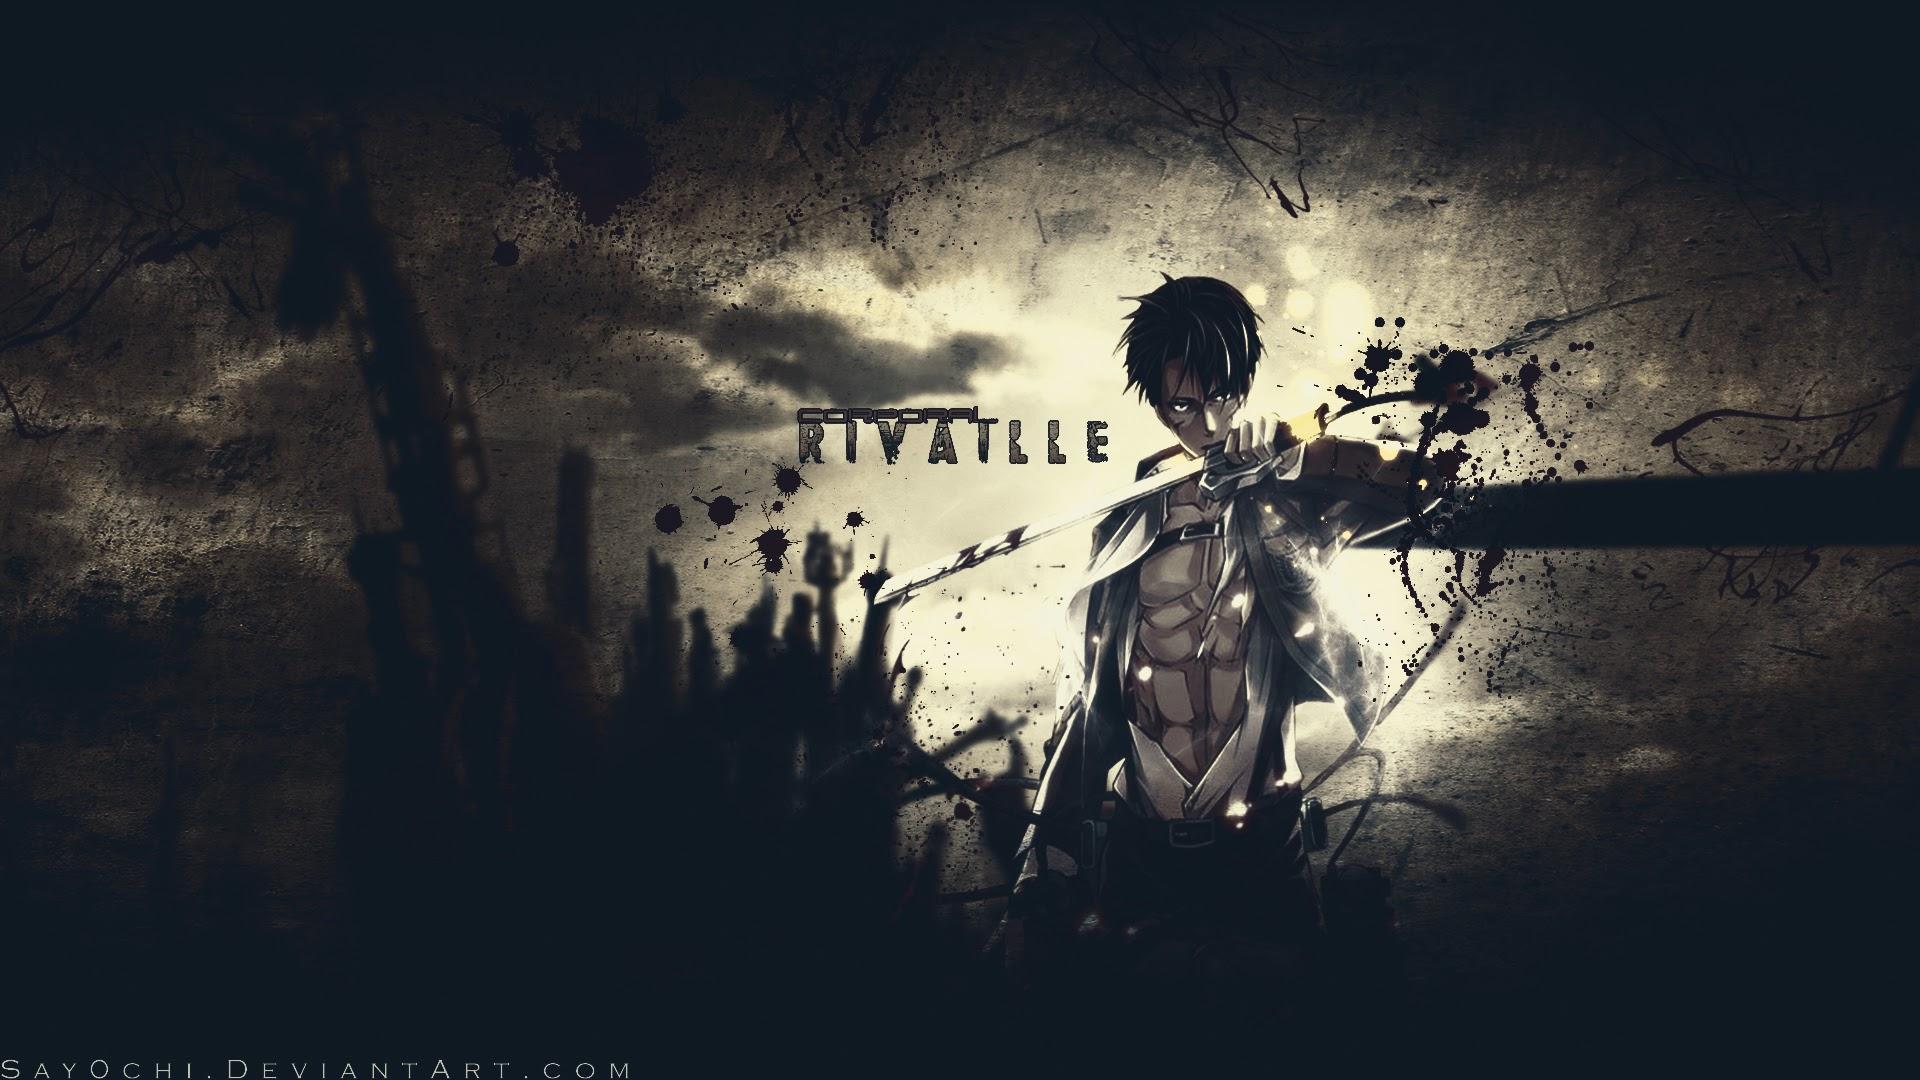 levi rivaille ttack on titan shingeki no kyojin anime hd wallpaper 1920x1080